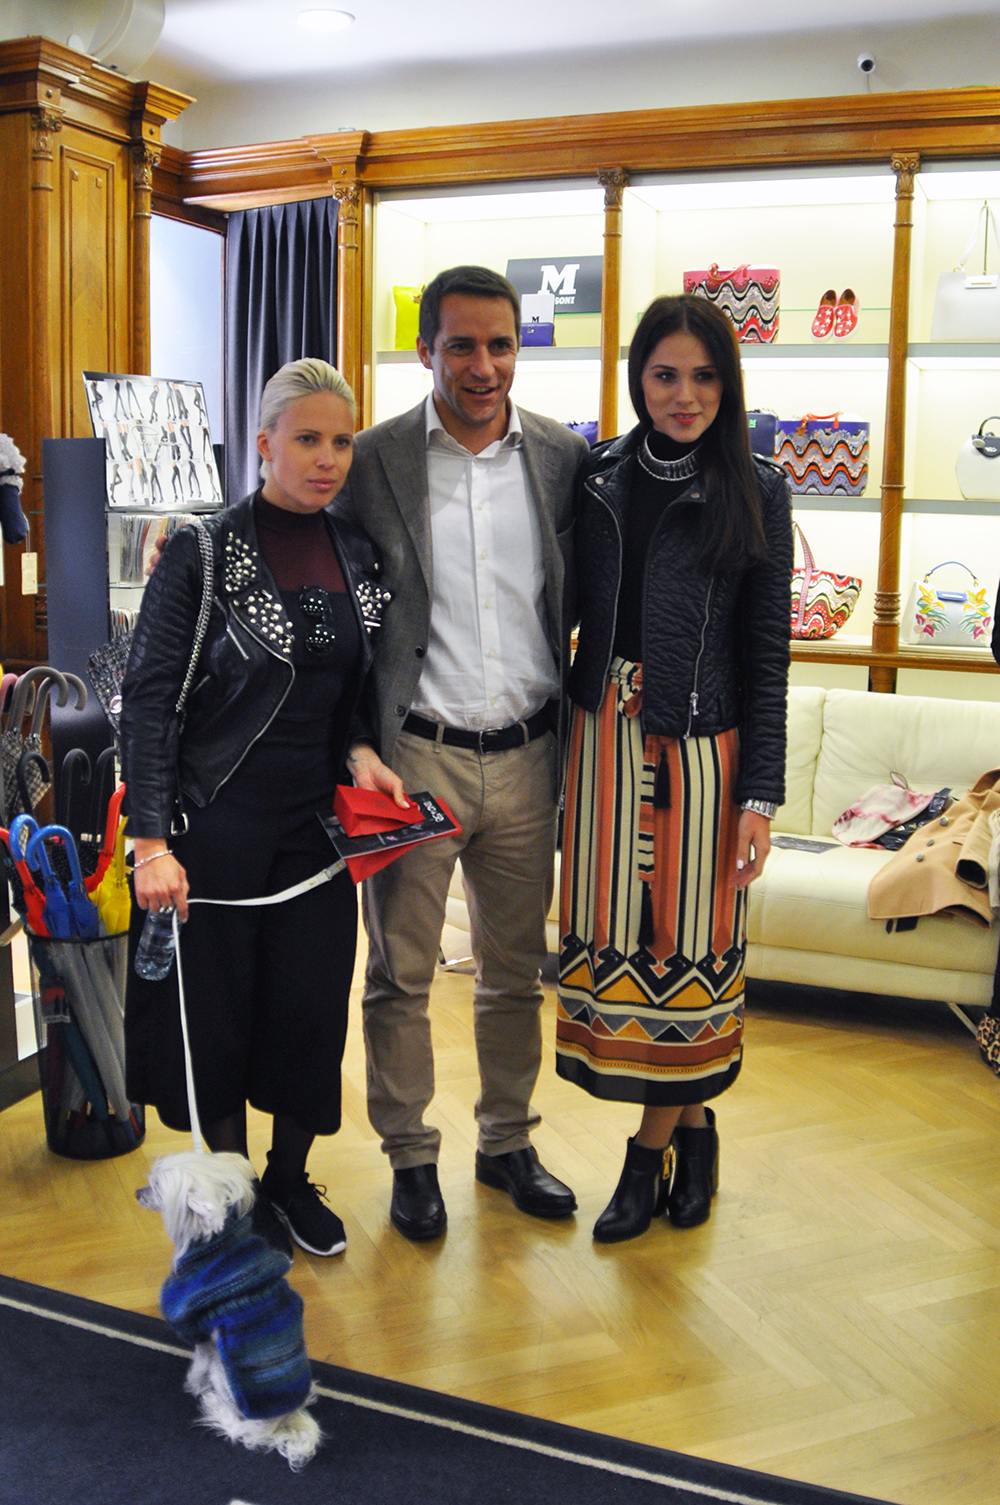 Manja Plešnar, Michele Giaconu in jaz, Eva Ahačevčič :)